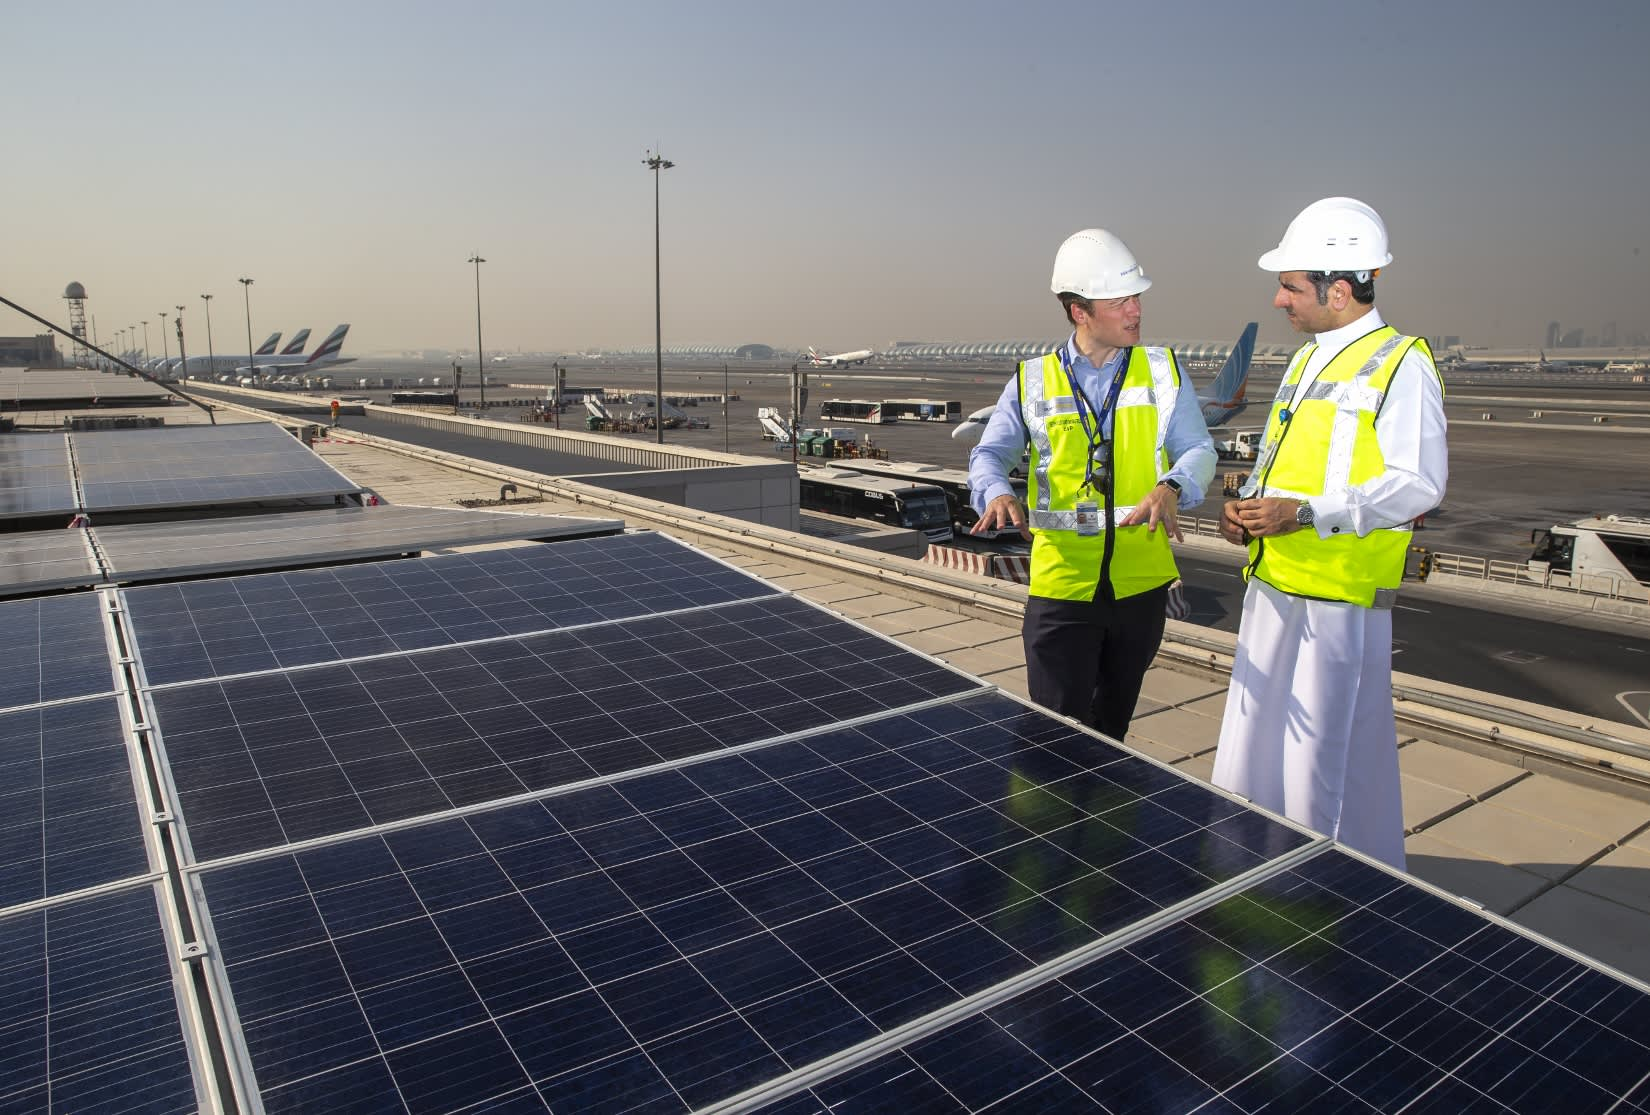 Dubai International airport installs 15,000 solar panels